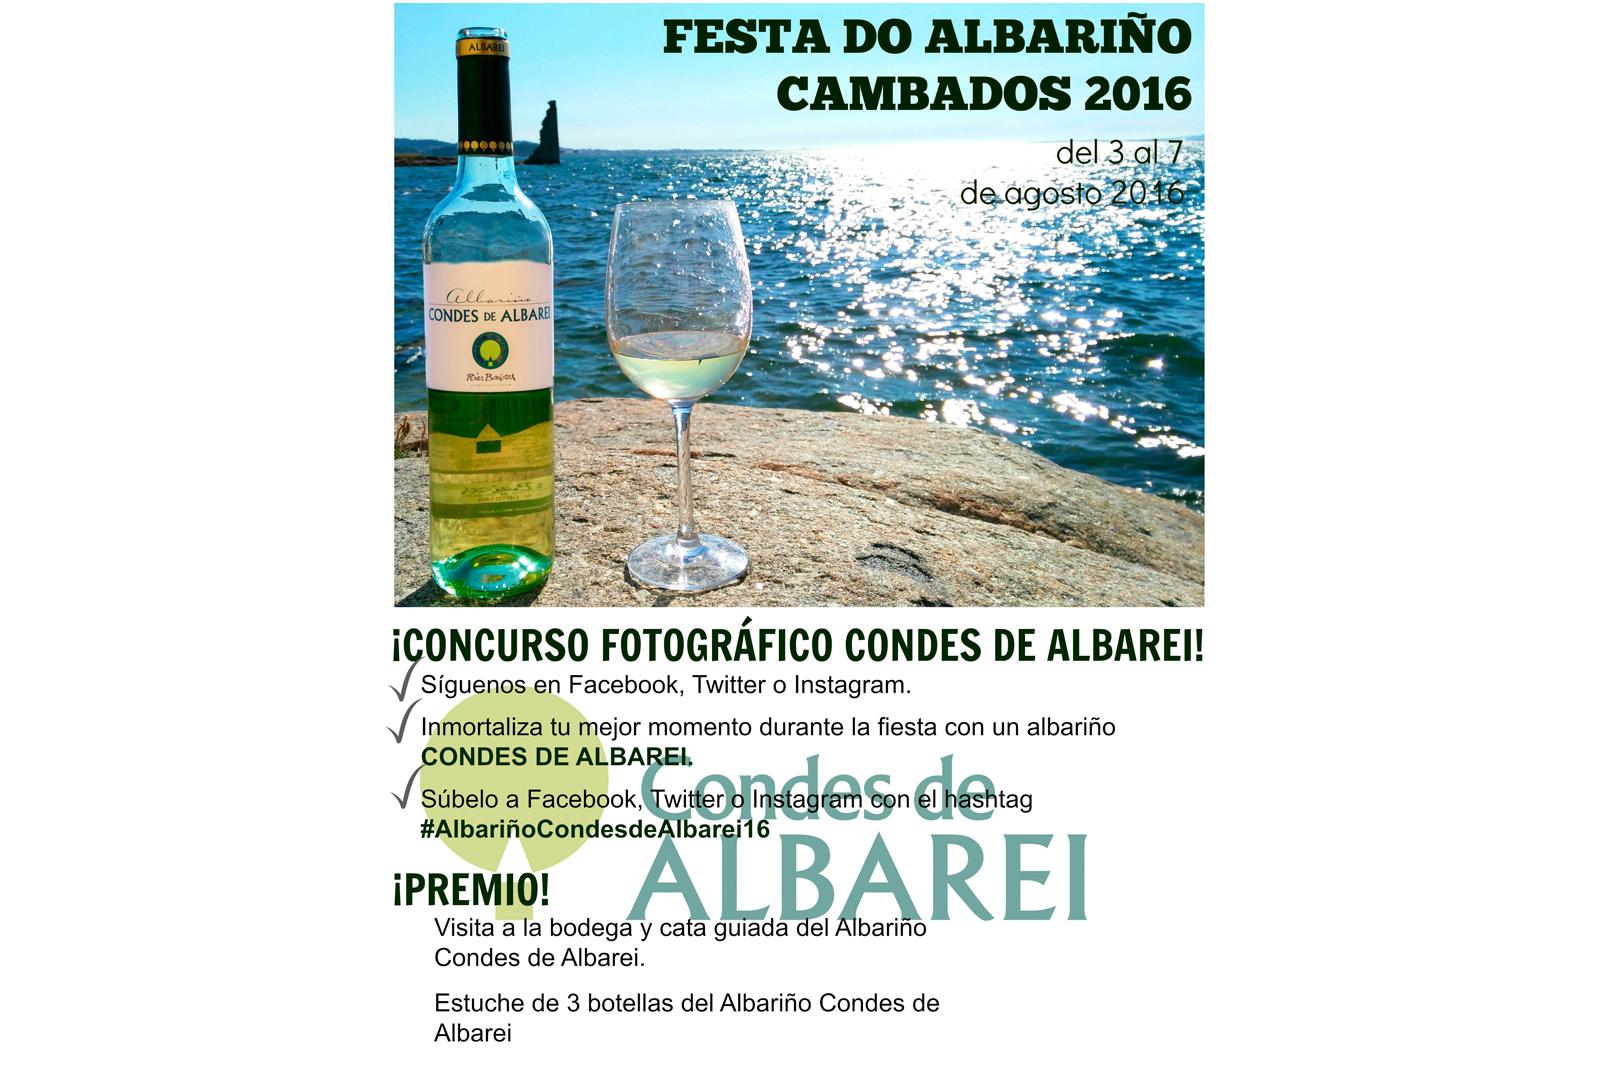 Condes de Albarei celebra su II Concurso Fotográfico